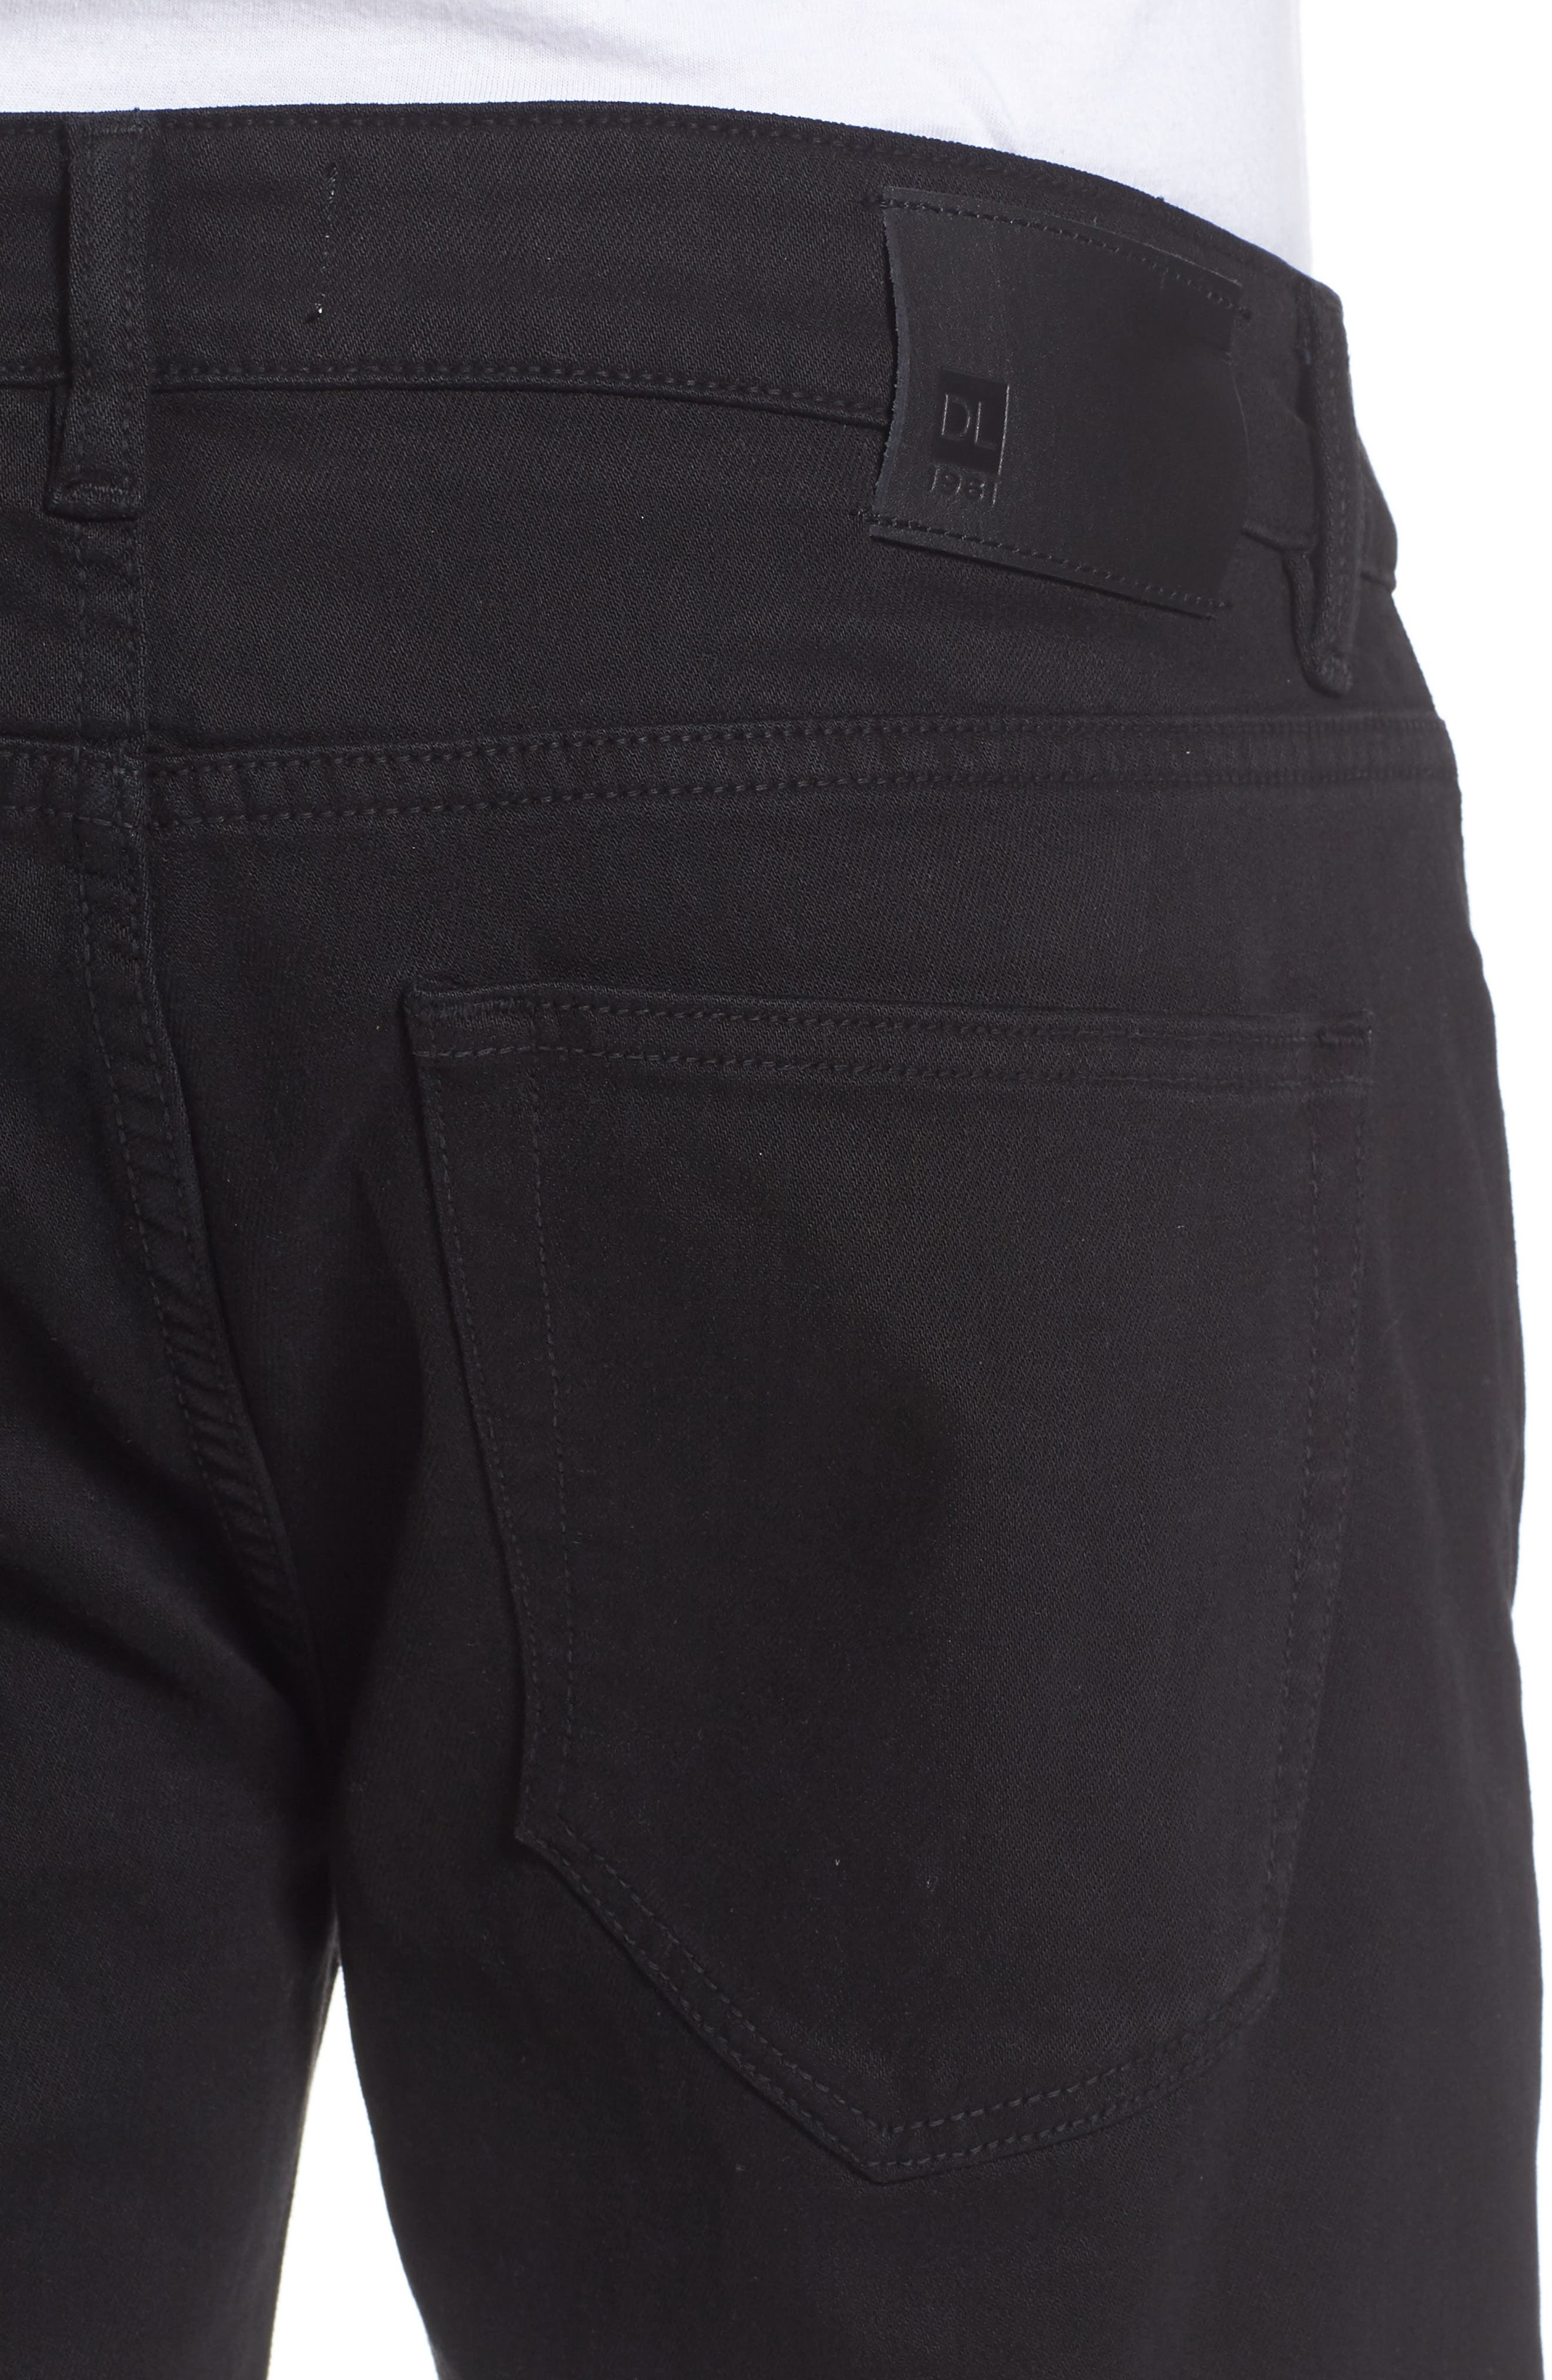 Nick Slim Fit Flat Front Pants,                             Alternate thumbnail 4, color,                             001